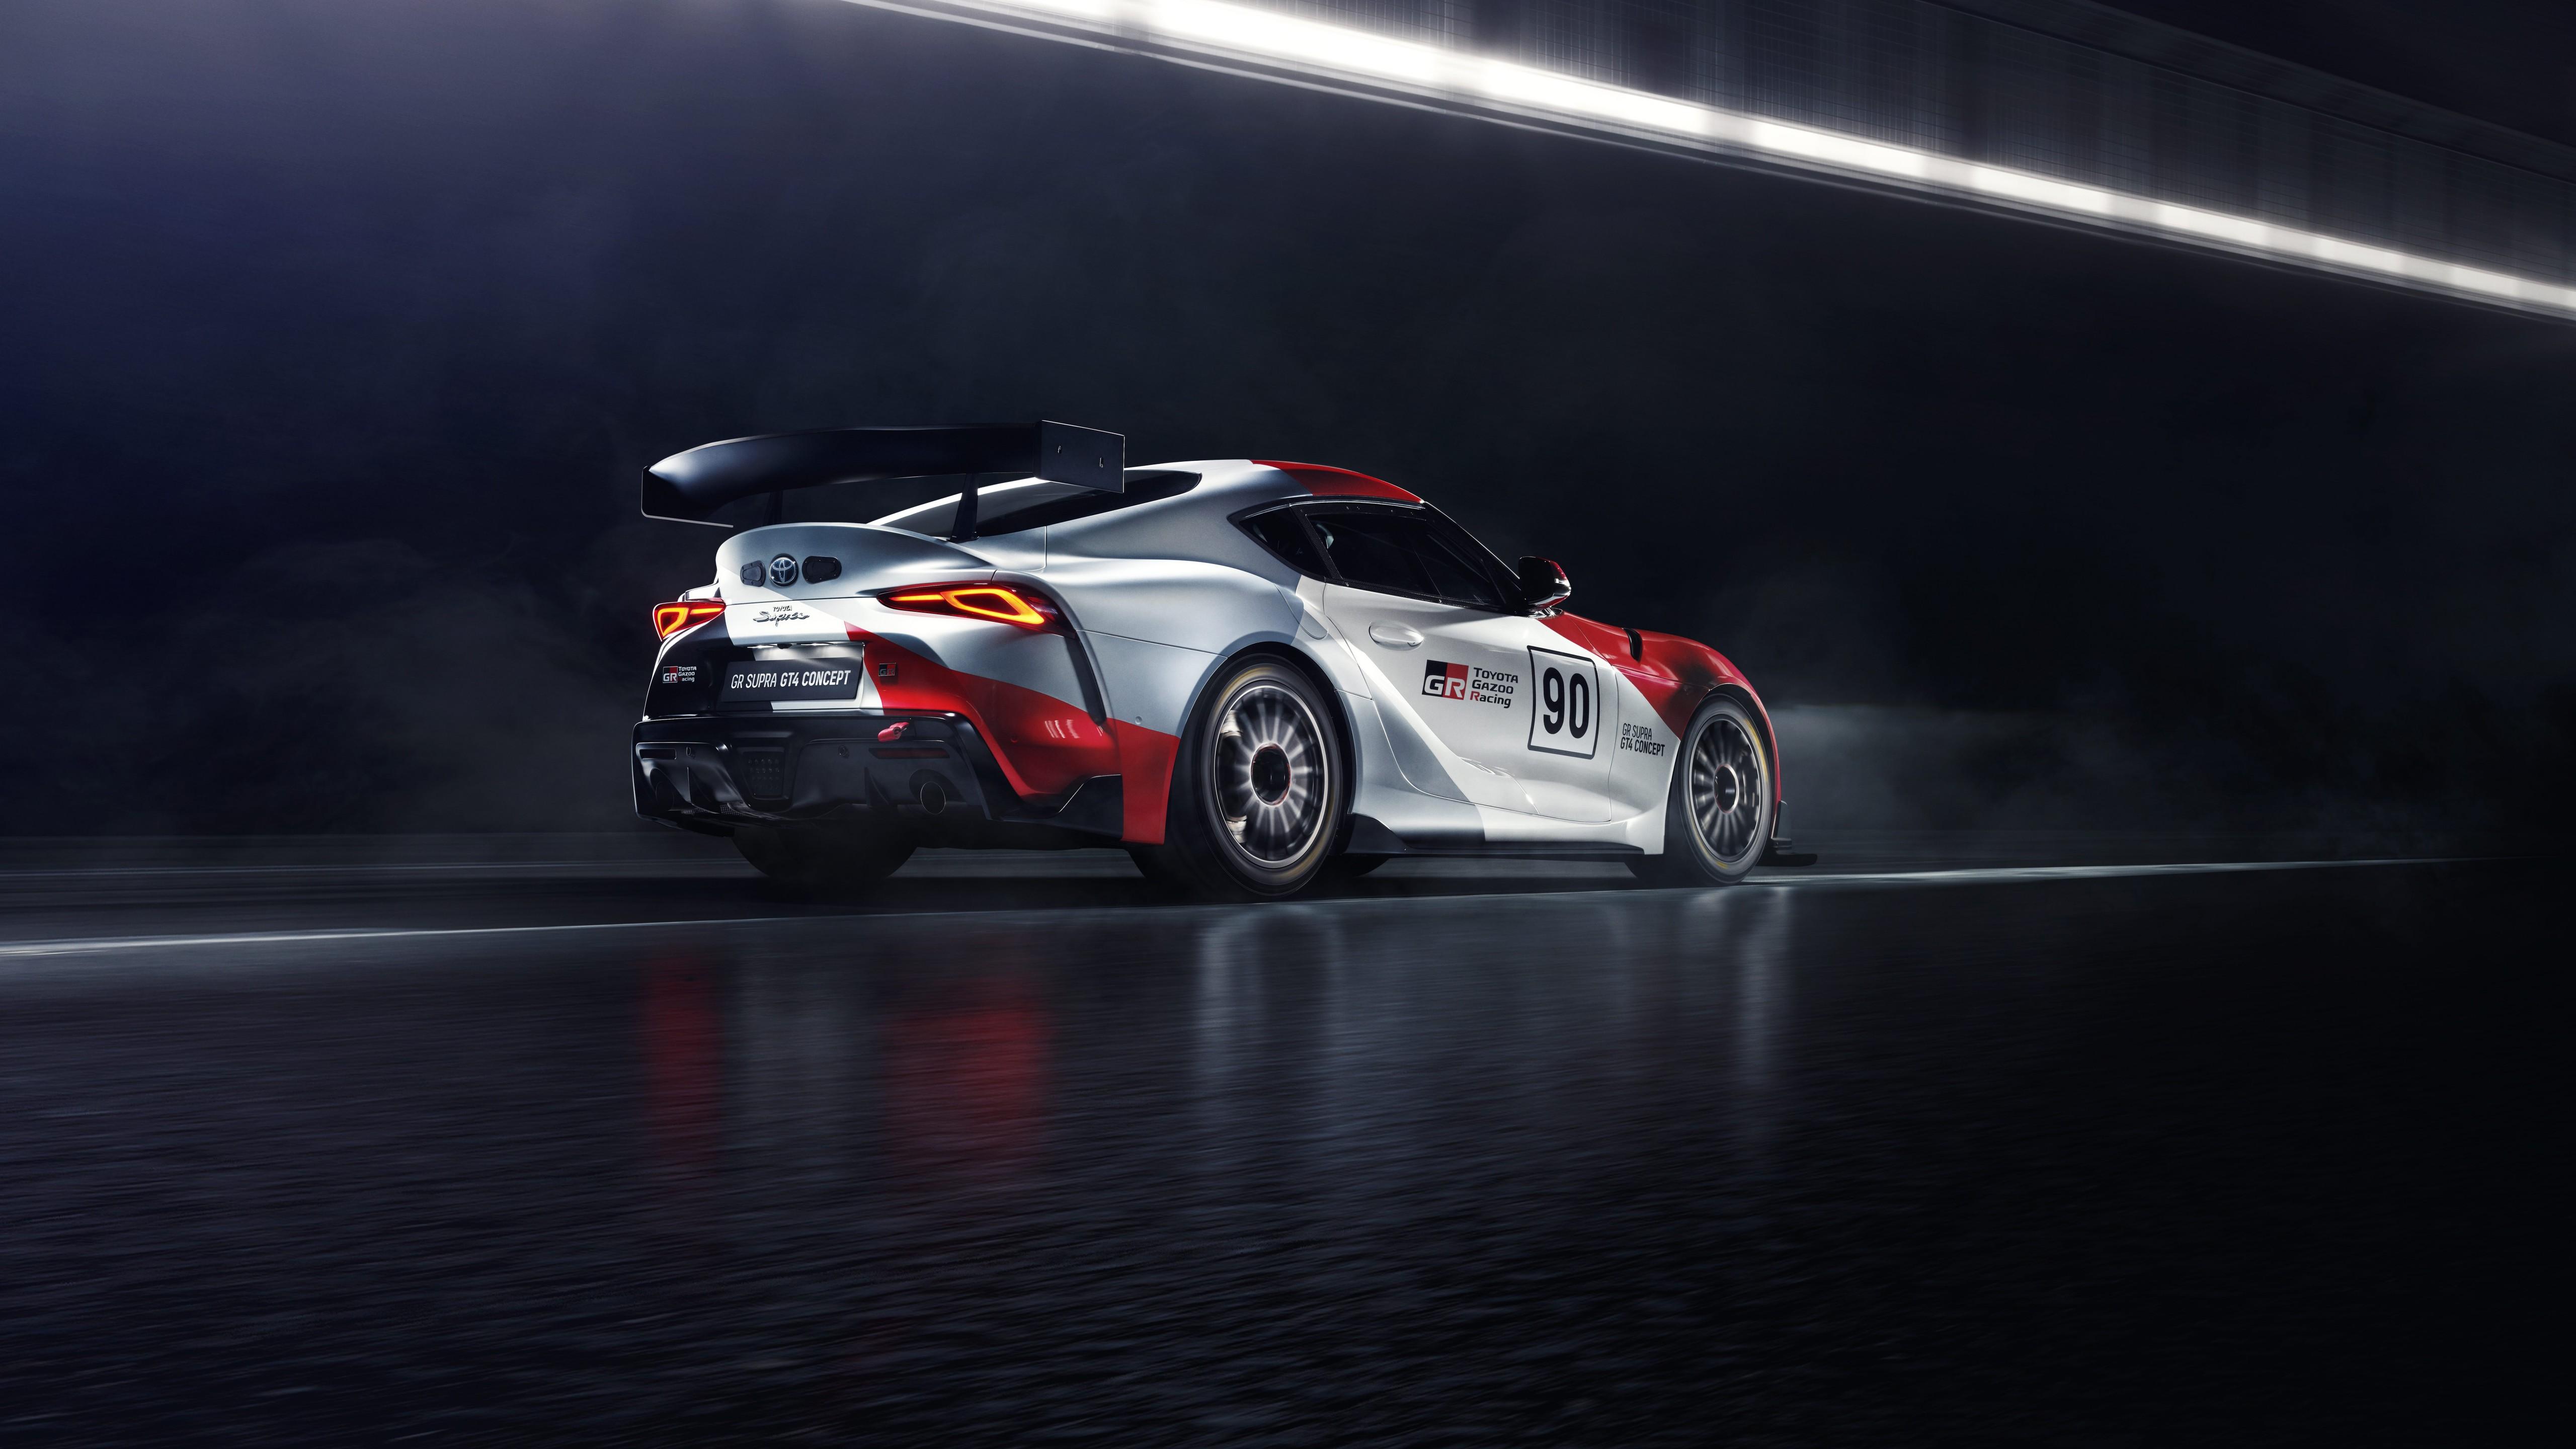 Wallpaper Toyota GR Supra GT4 2019 Cars Geneva Motor Show 2019 5120x2880